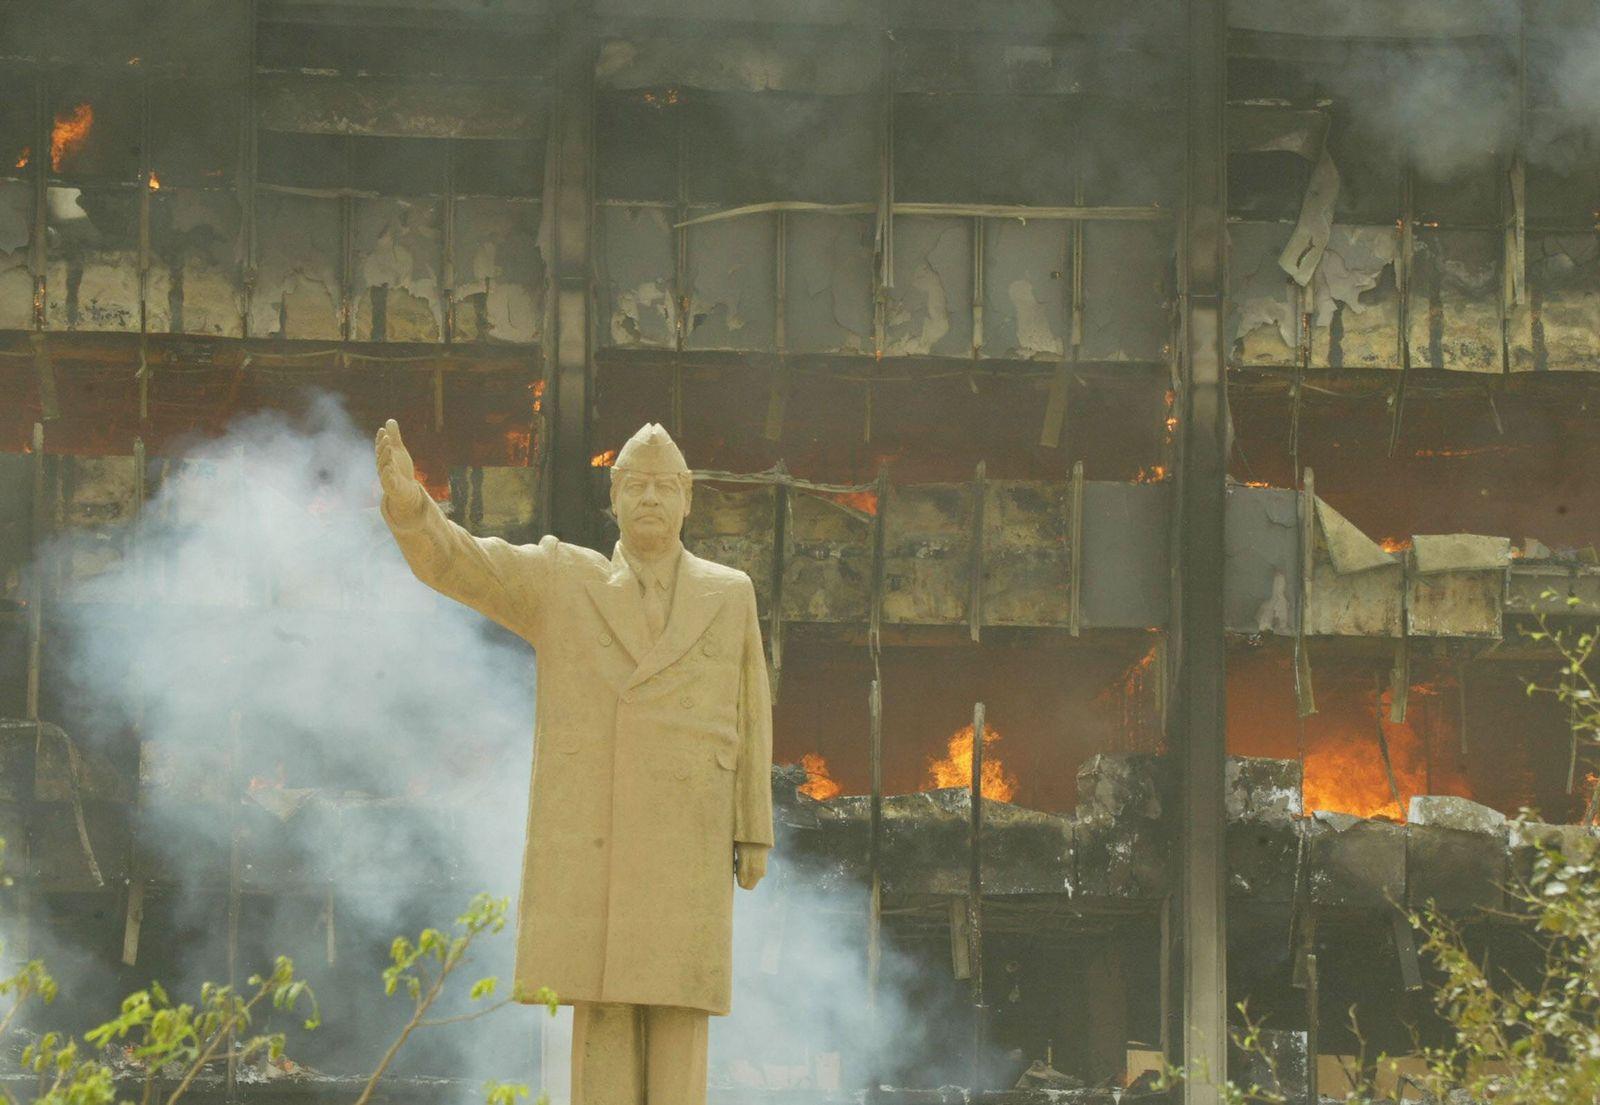 SPTV 15.03.2012 Amerika im Treibsand Teil 1 / Saddam Hussein Statue